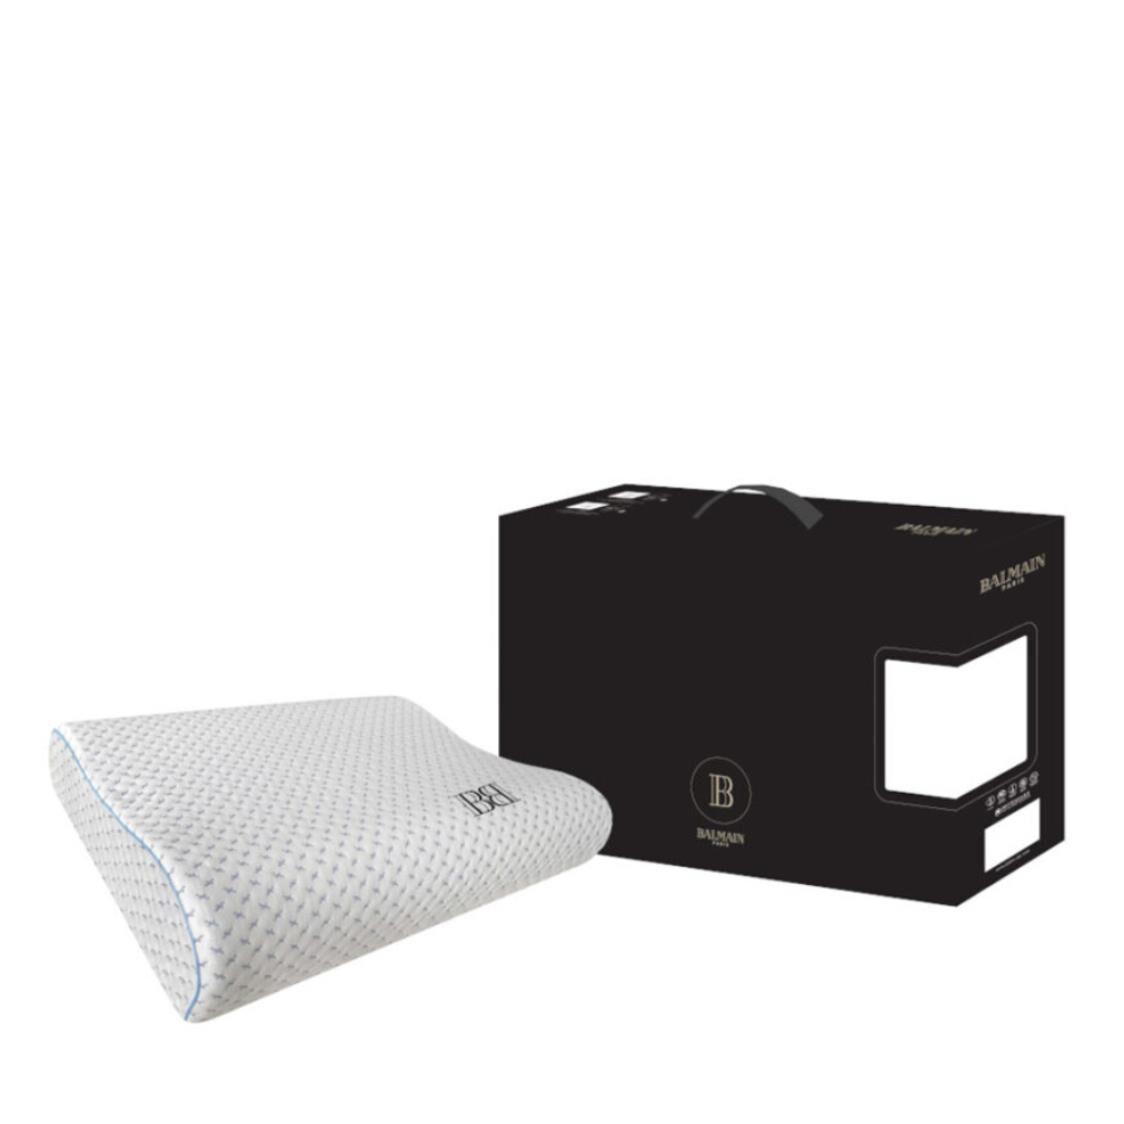 Balmain Black Label Cooltech Memory Foam Contour Pillow